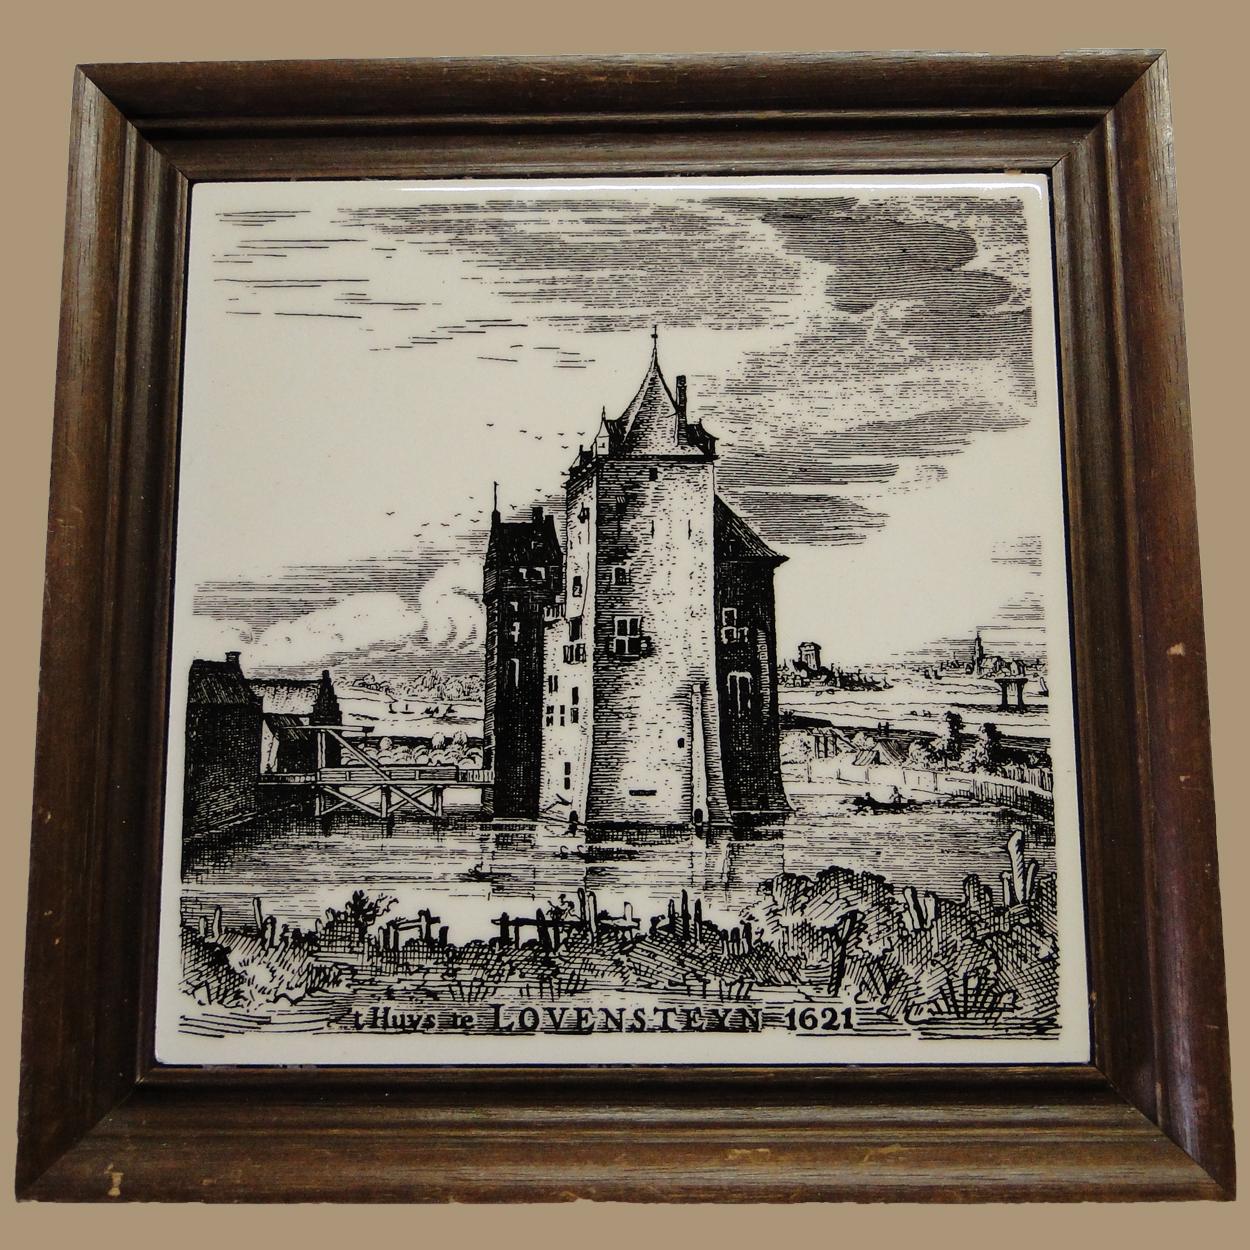 TEGE-001-t-Huys-Loevenstein-1621